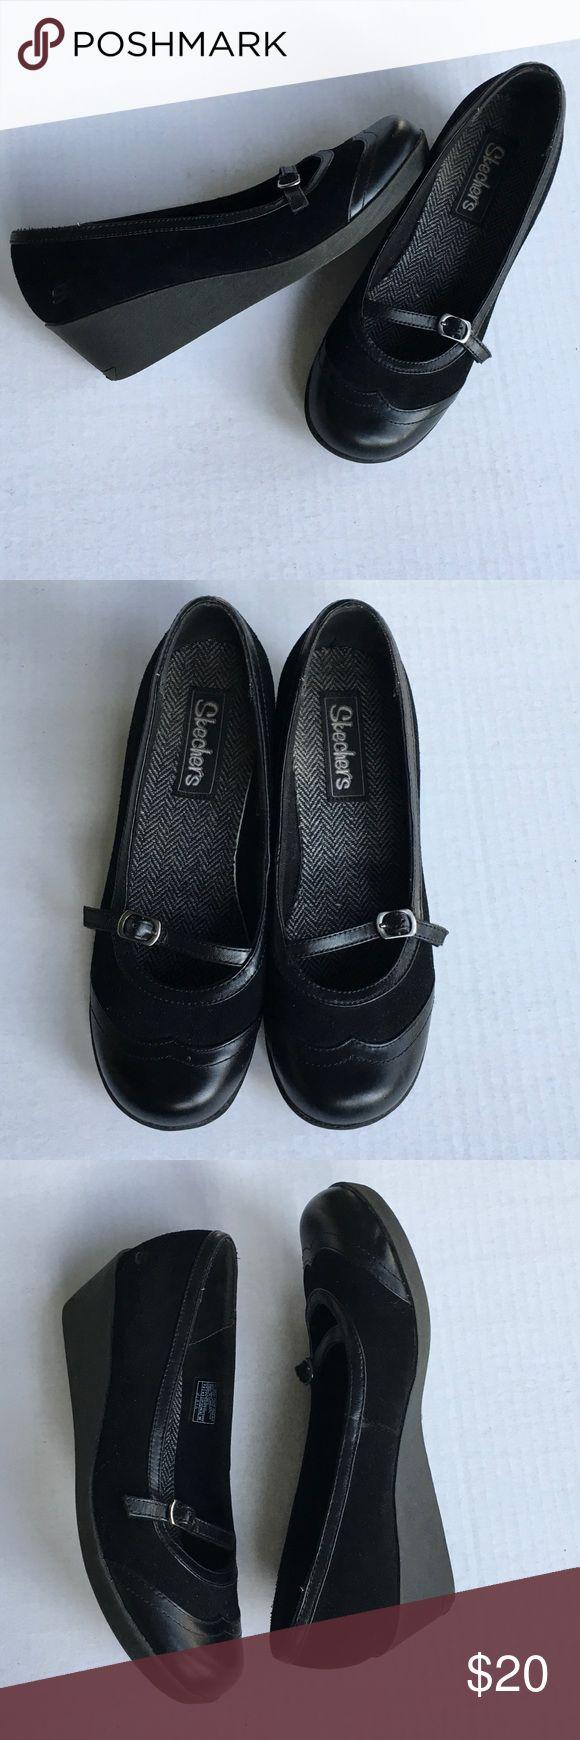 Skechers  BLACK SHOES WOMENS SIZE 7 1/2